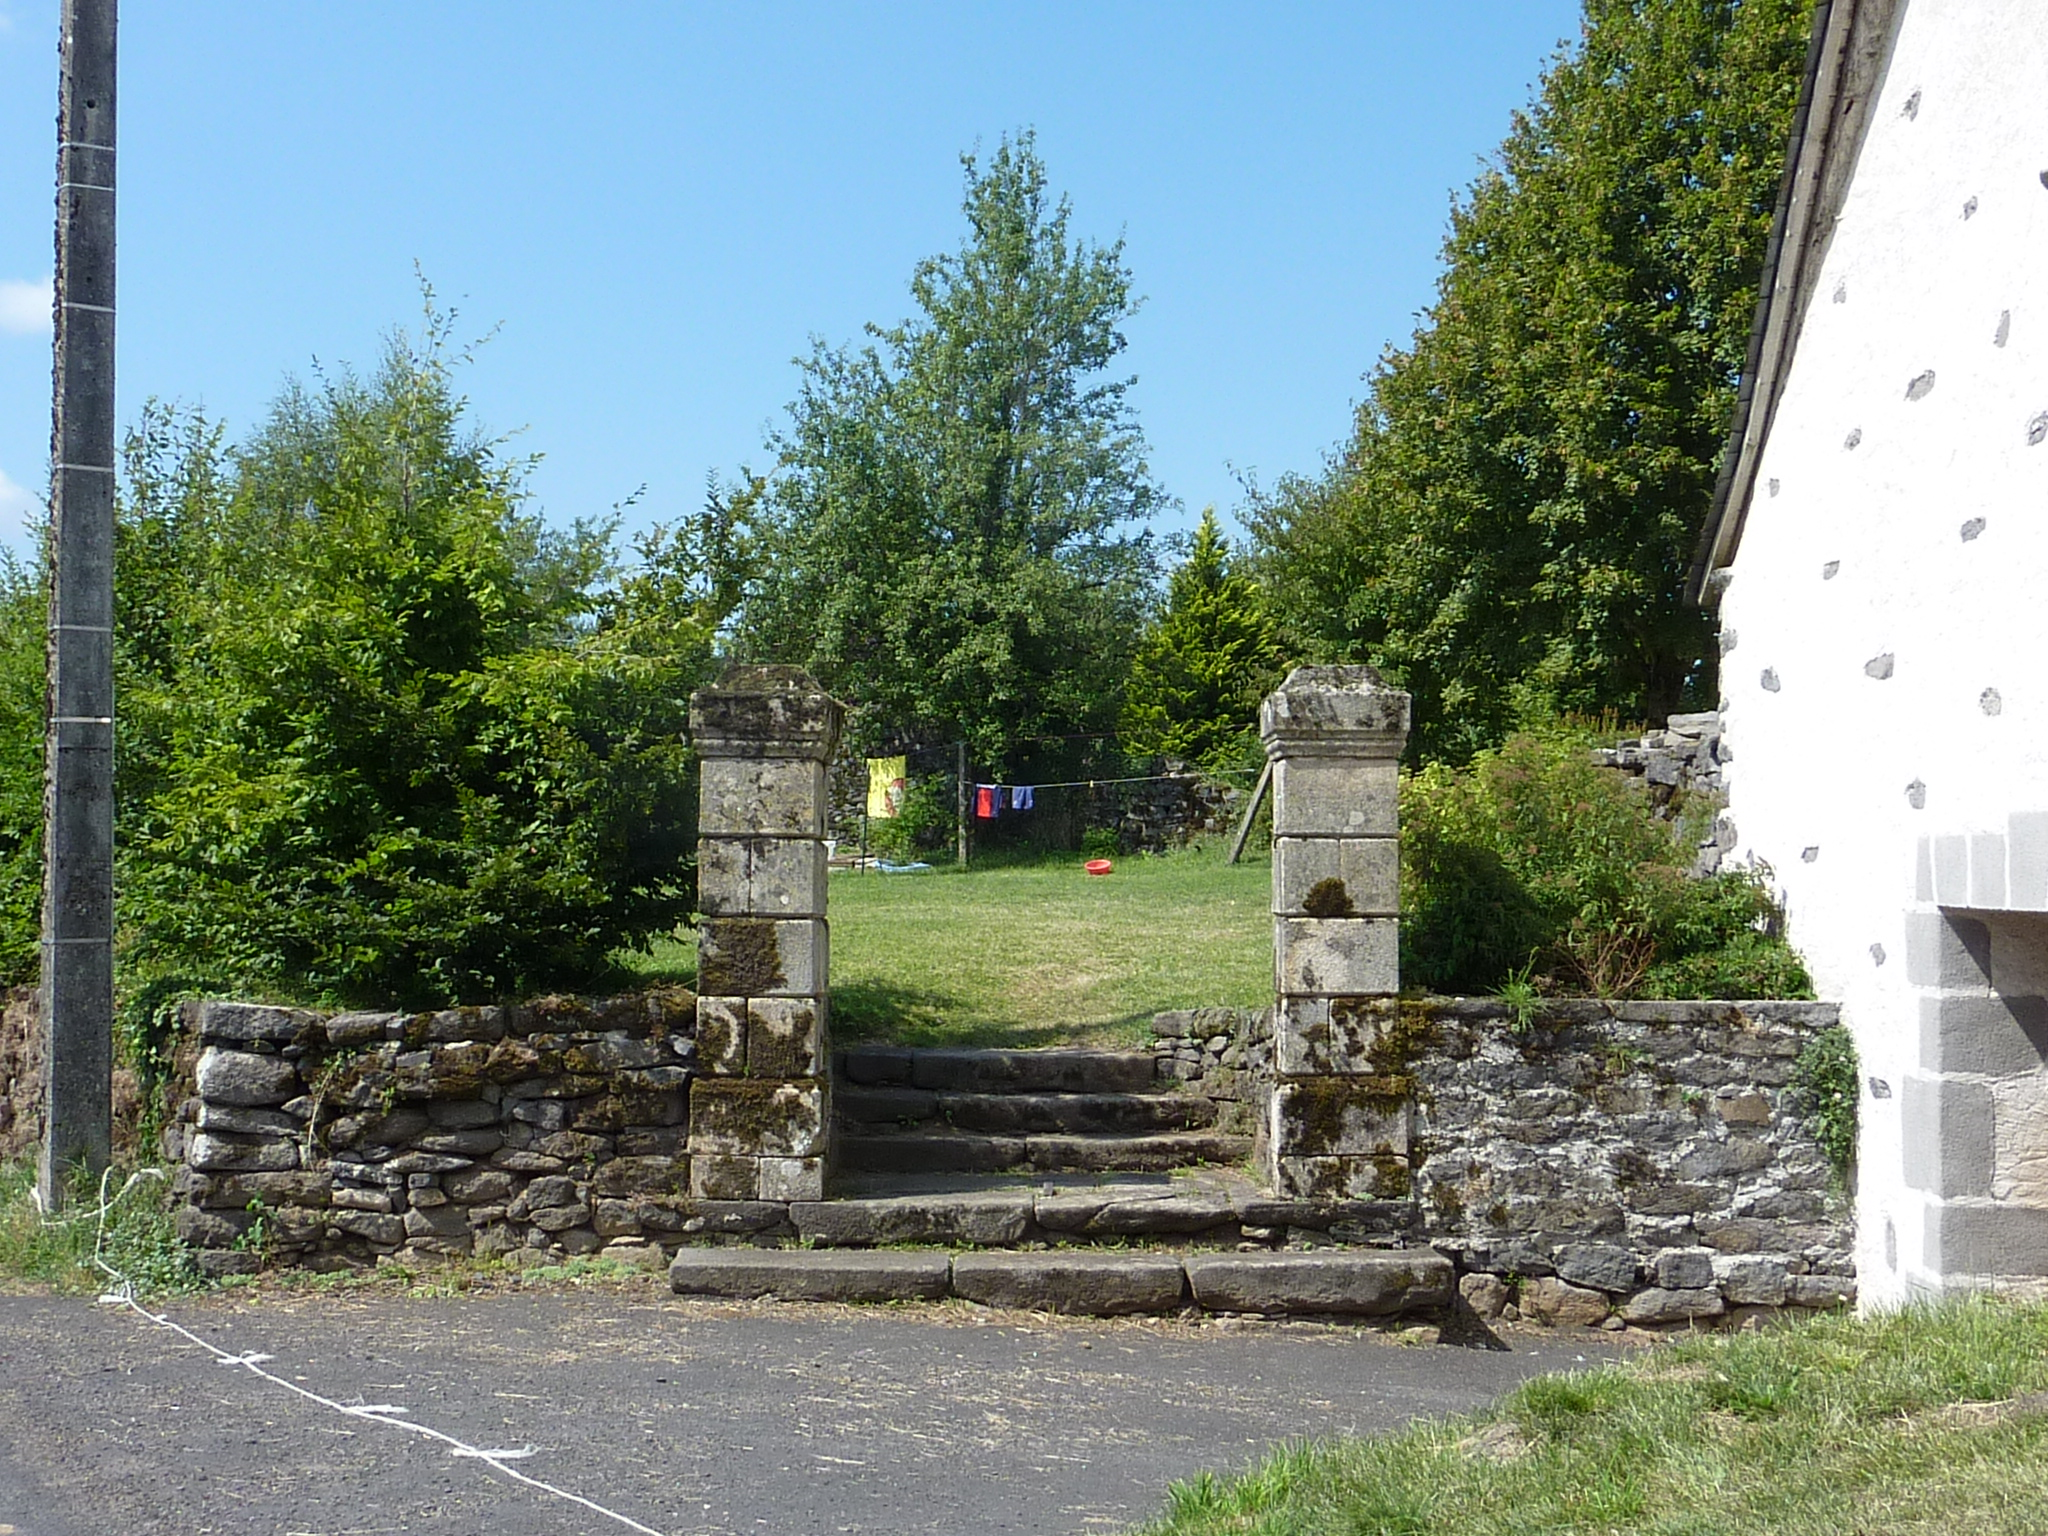 l'accès au jardin clos